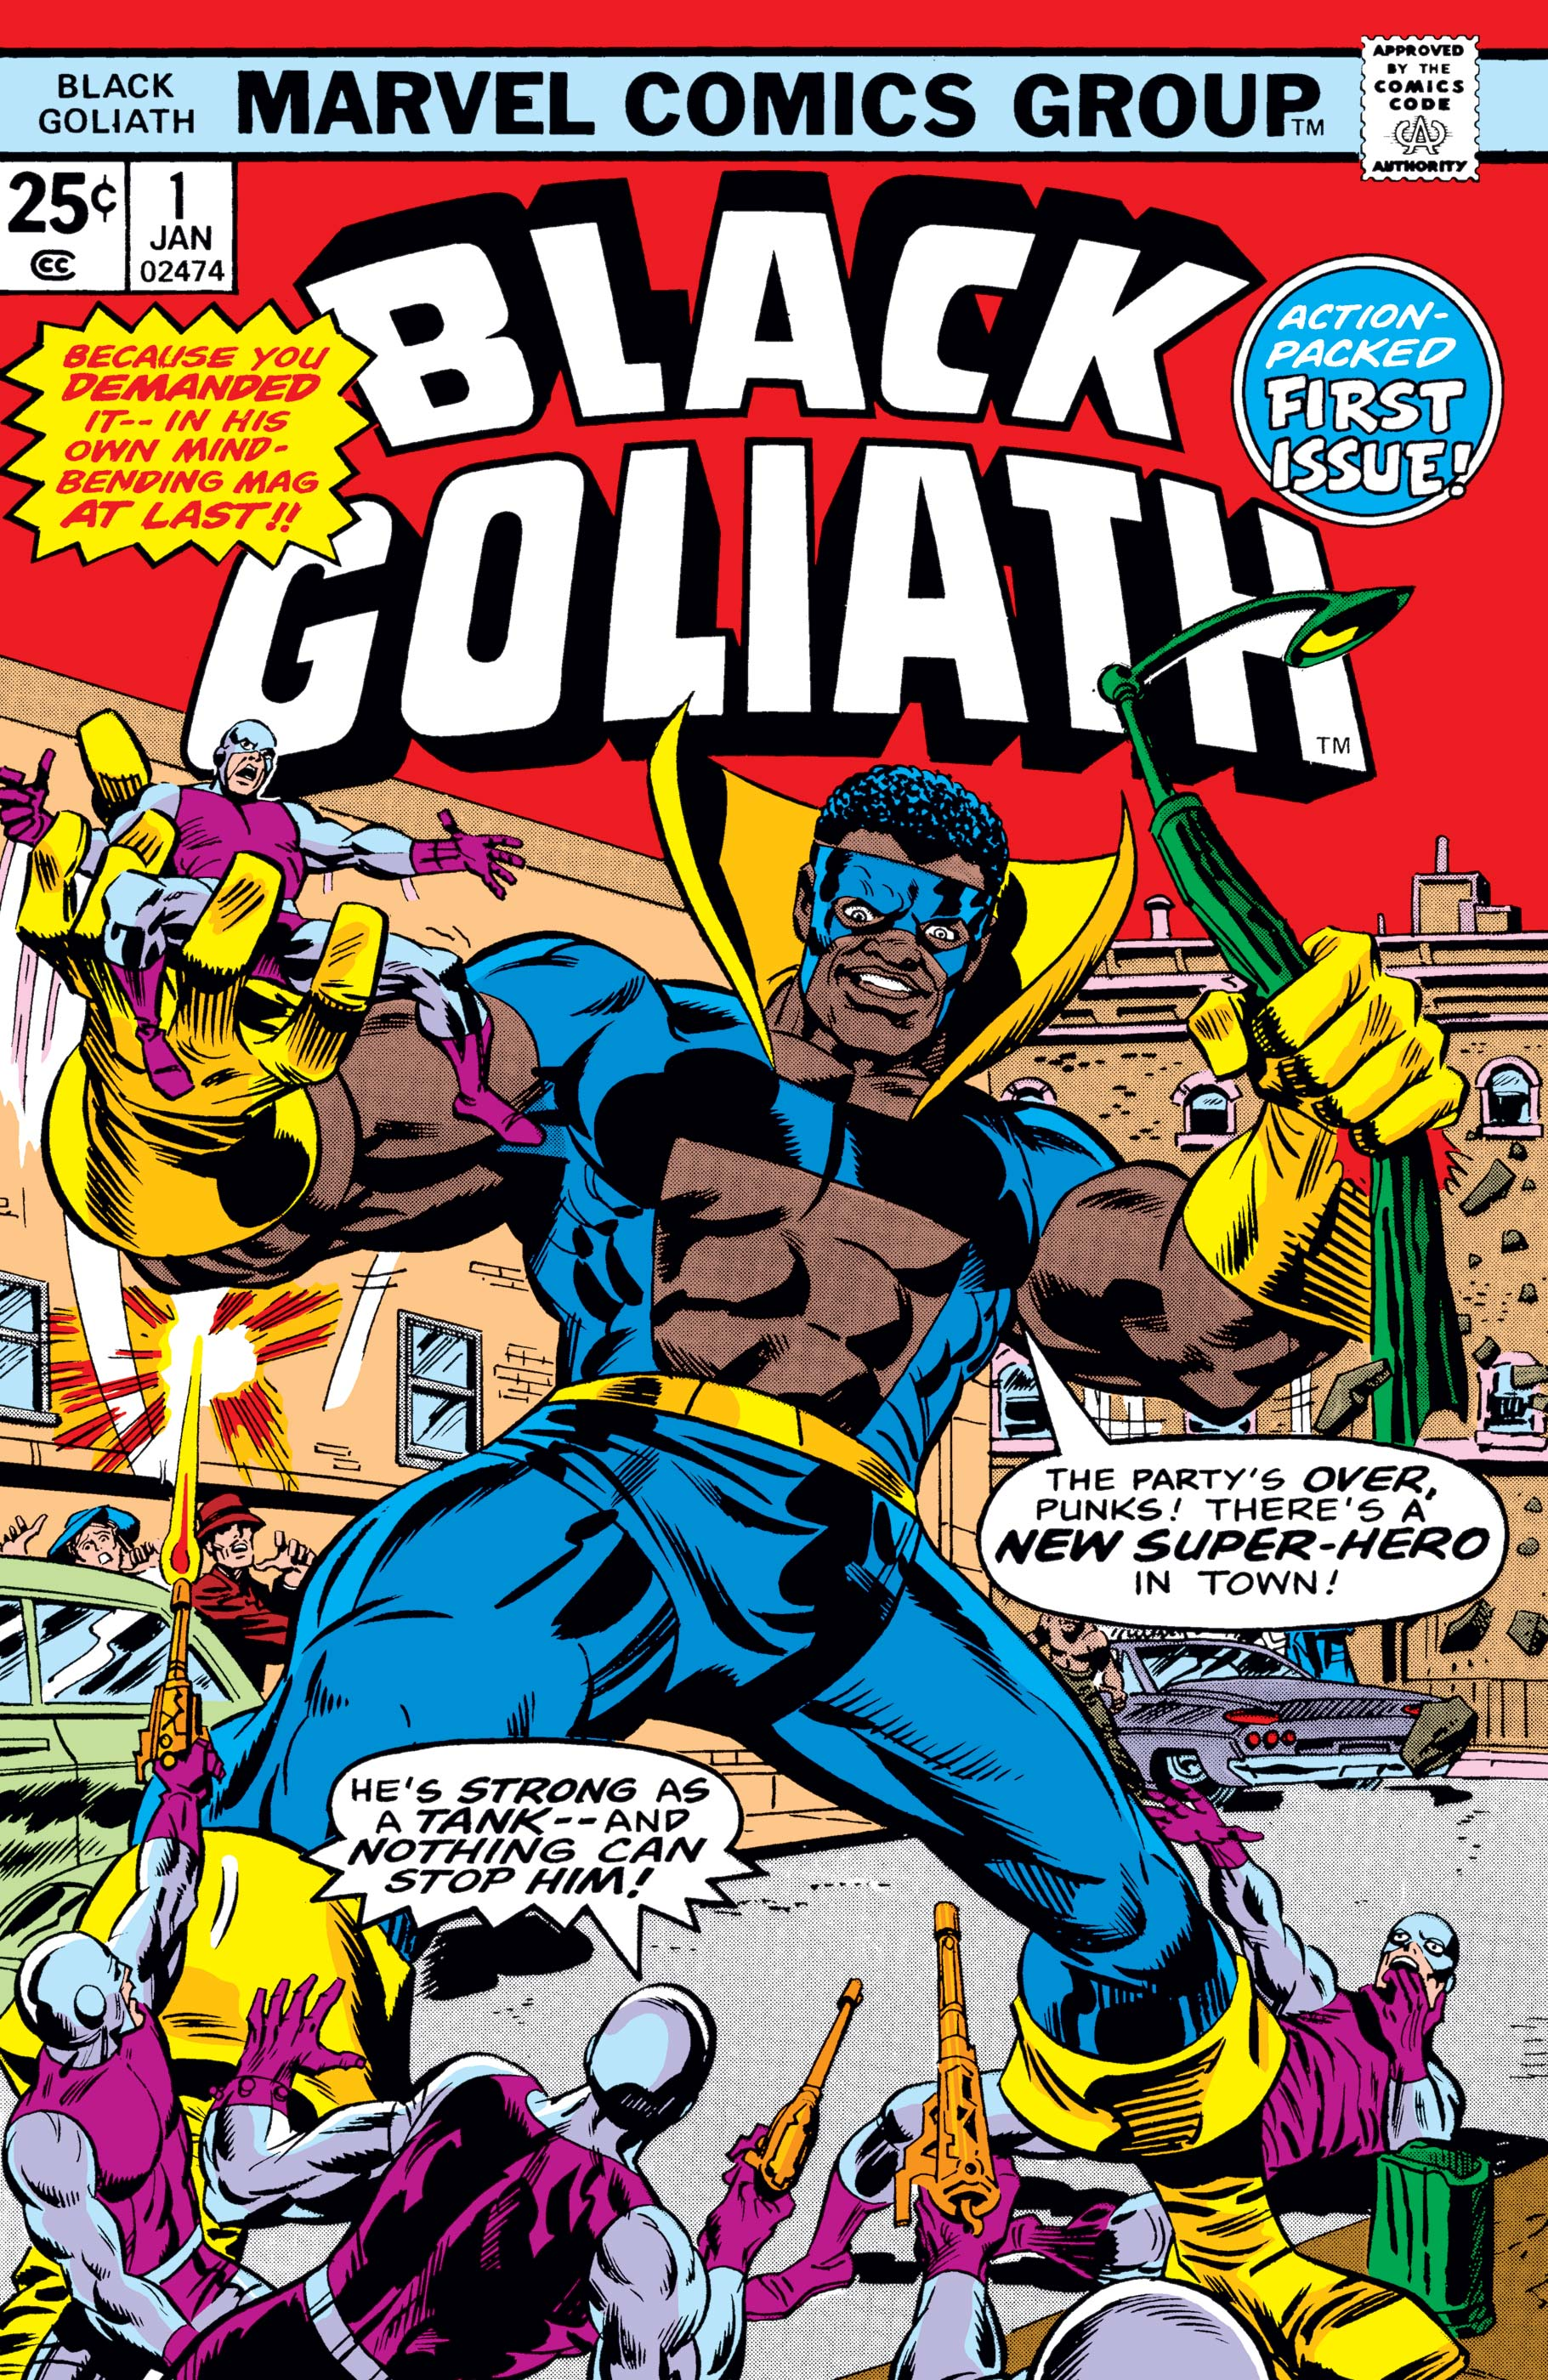 Black Goliath (1976) #1